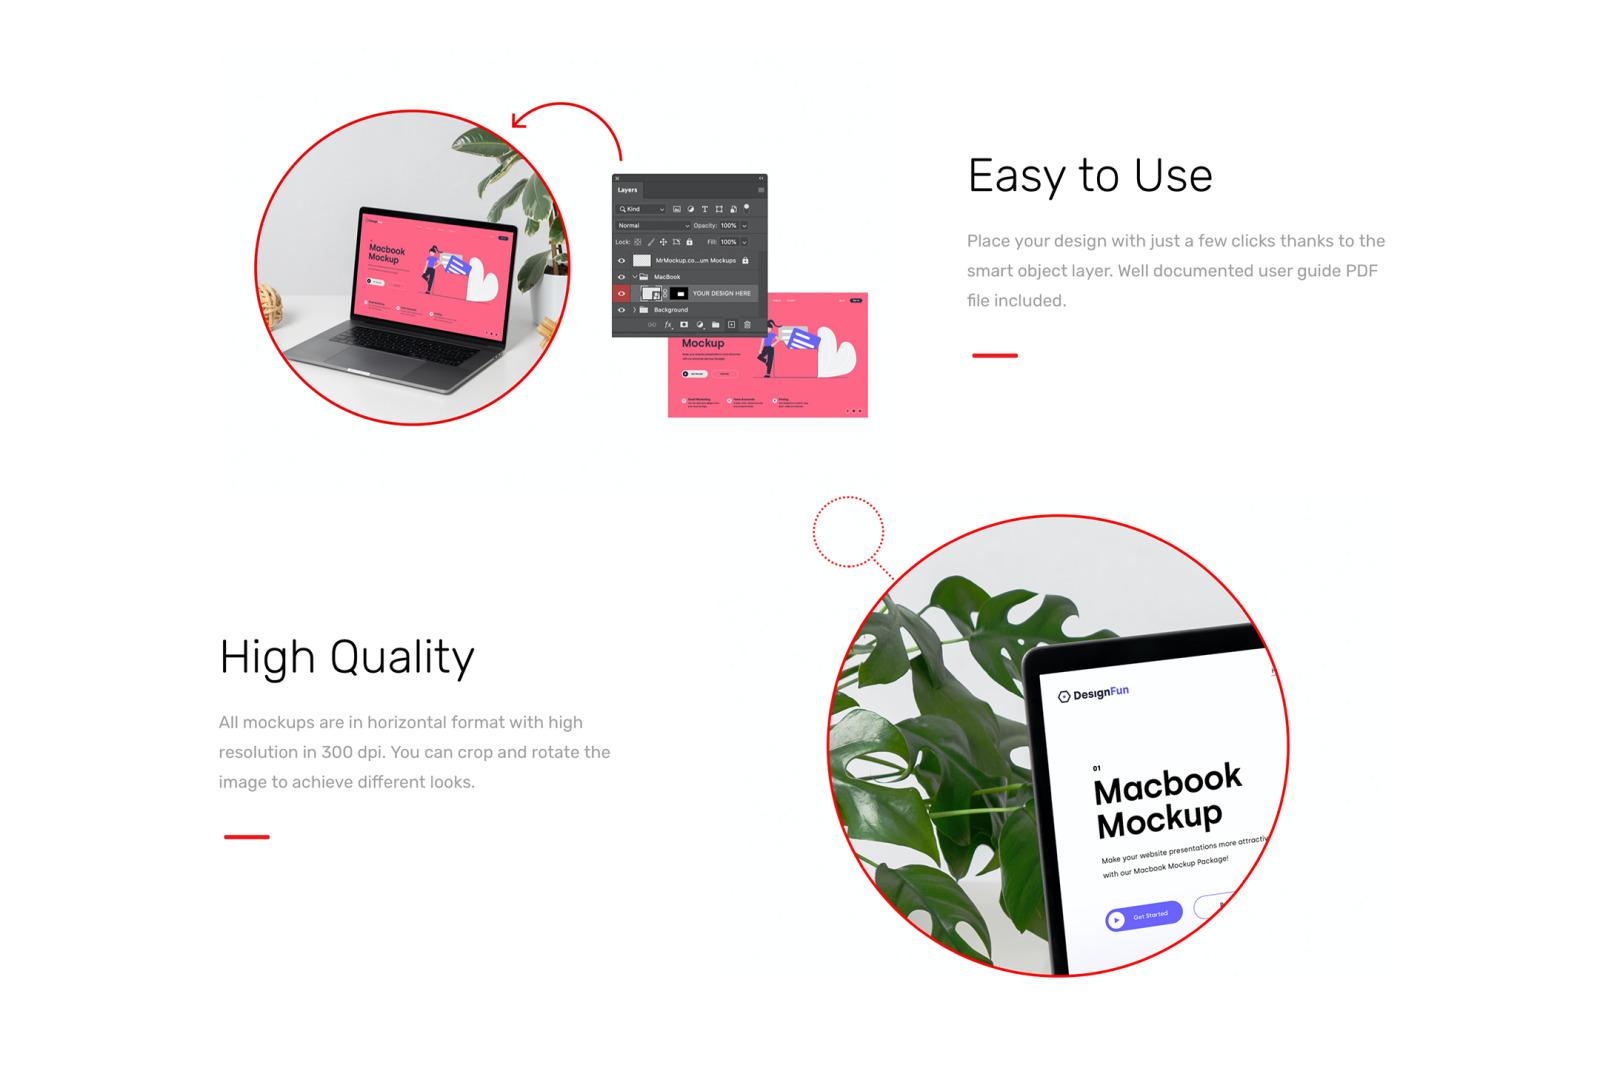 Macbook Pro Mockups - Workspace Mockup